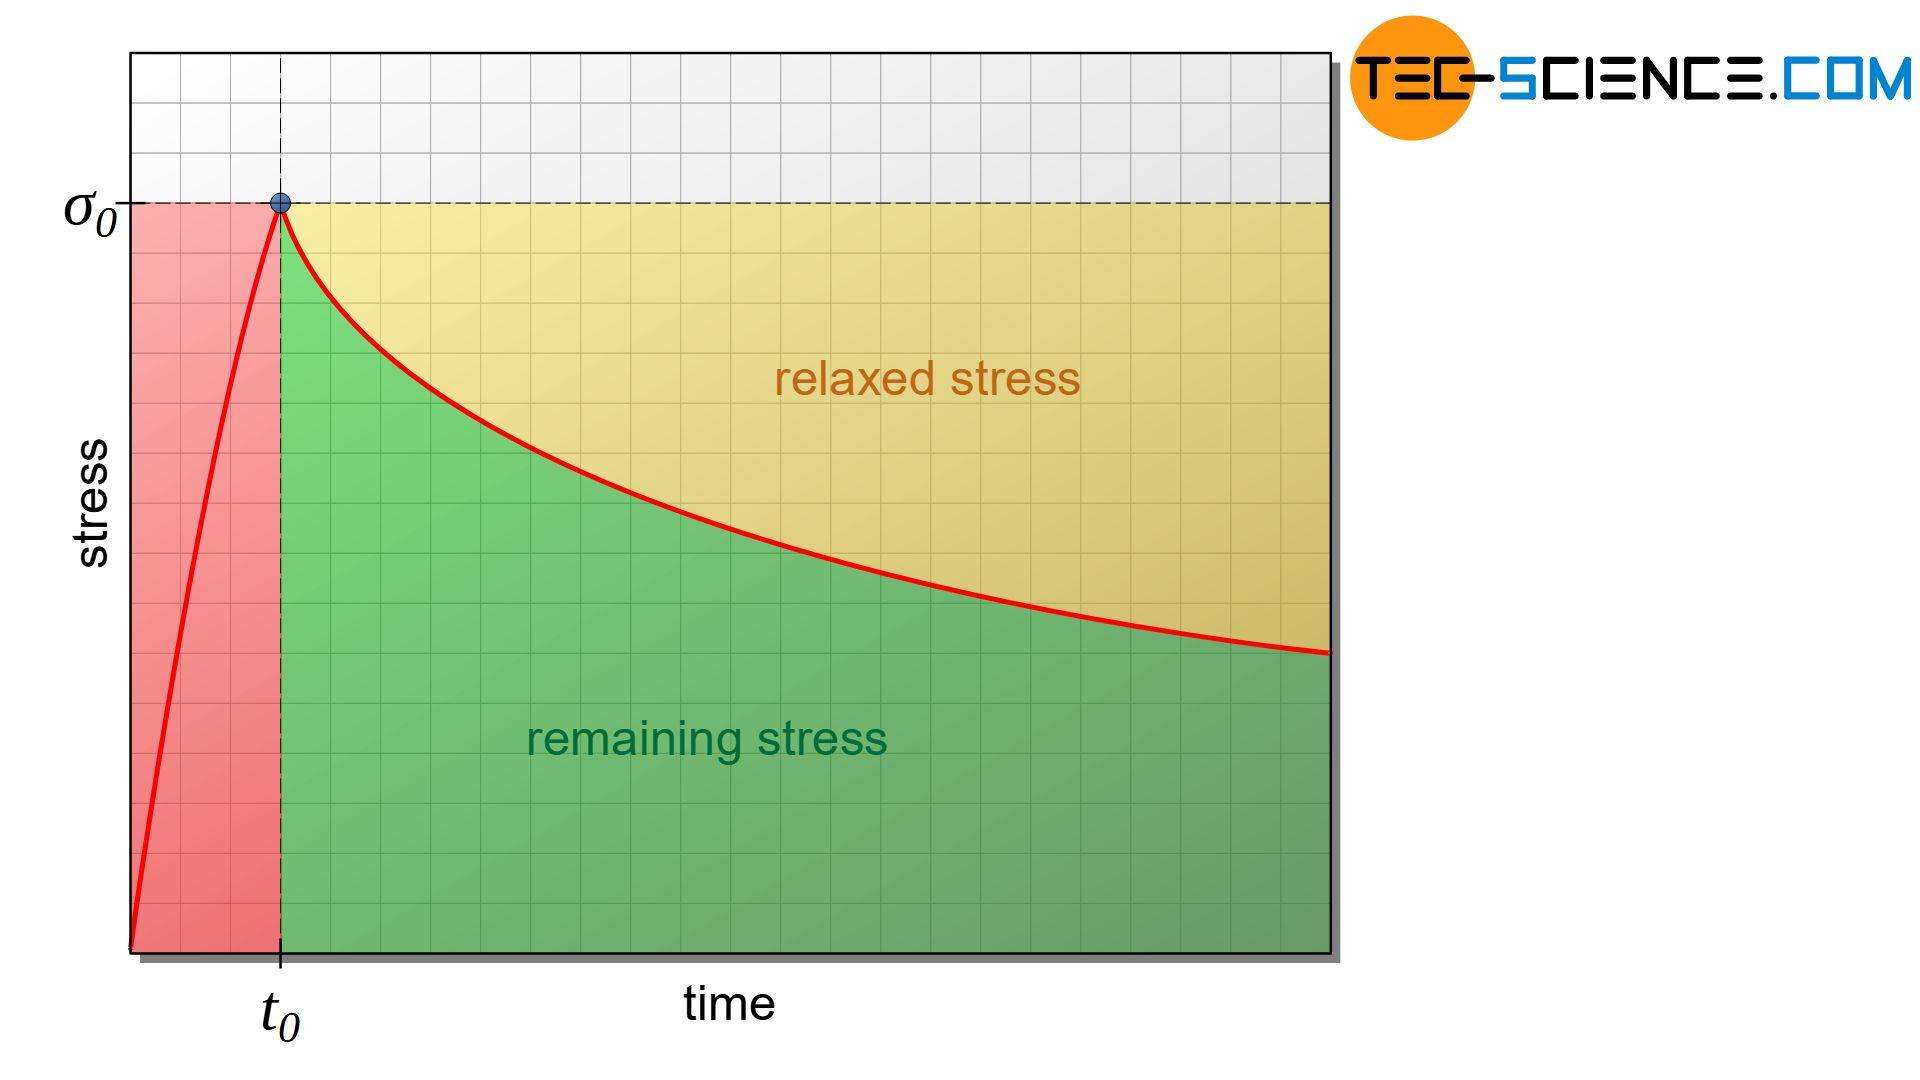 Temporal decrease in stress